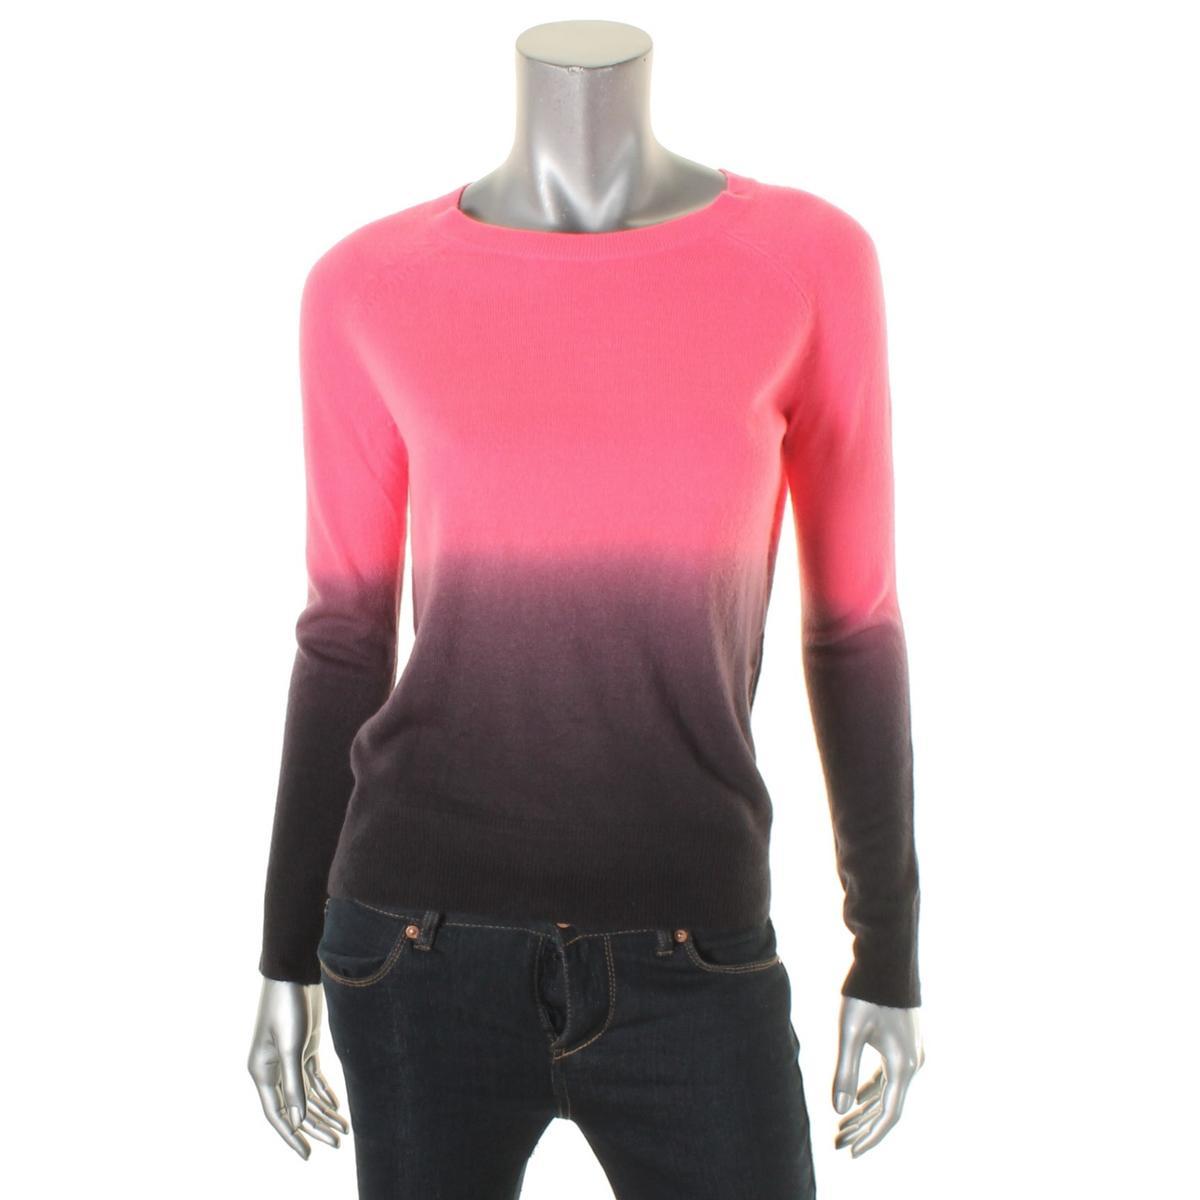 Aqua 1730 Womens Knit Dip-Dye Crew Neck Sweater Top BHFO | eBay